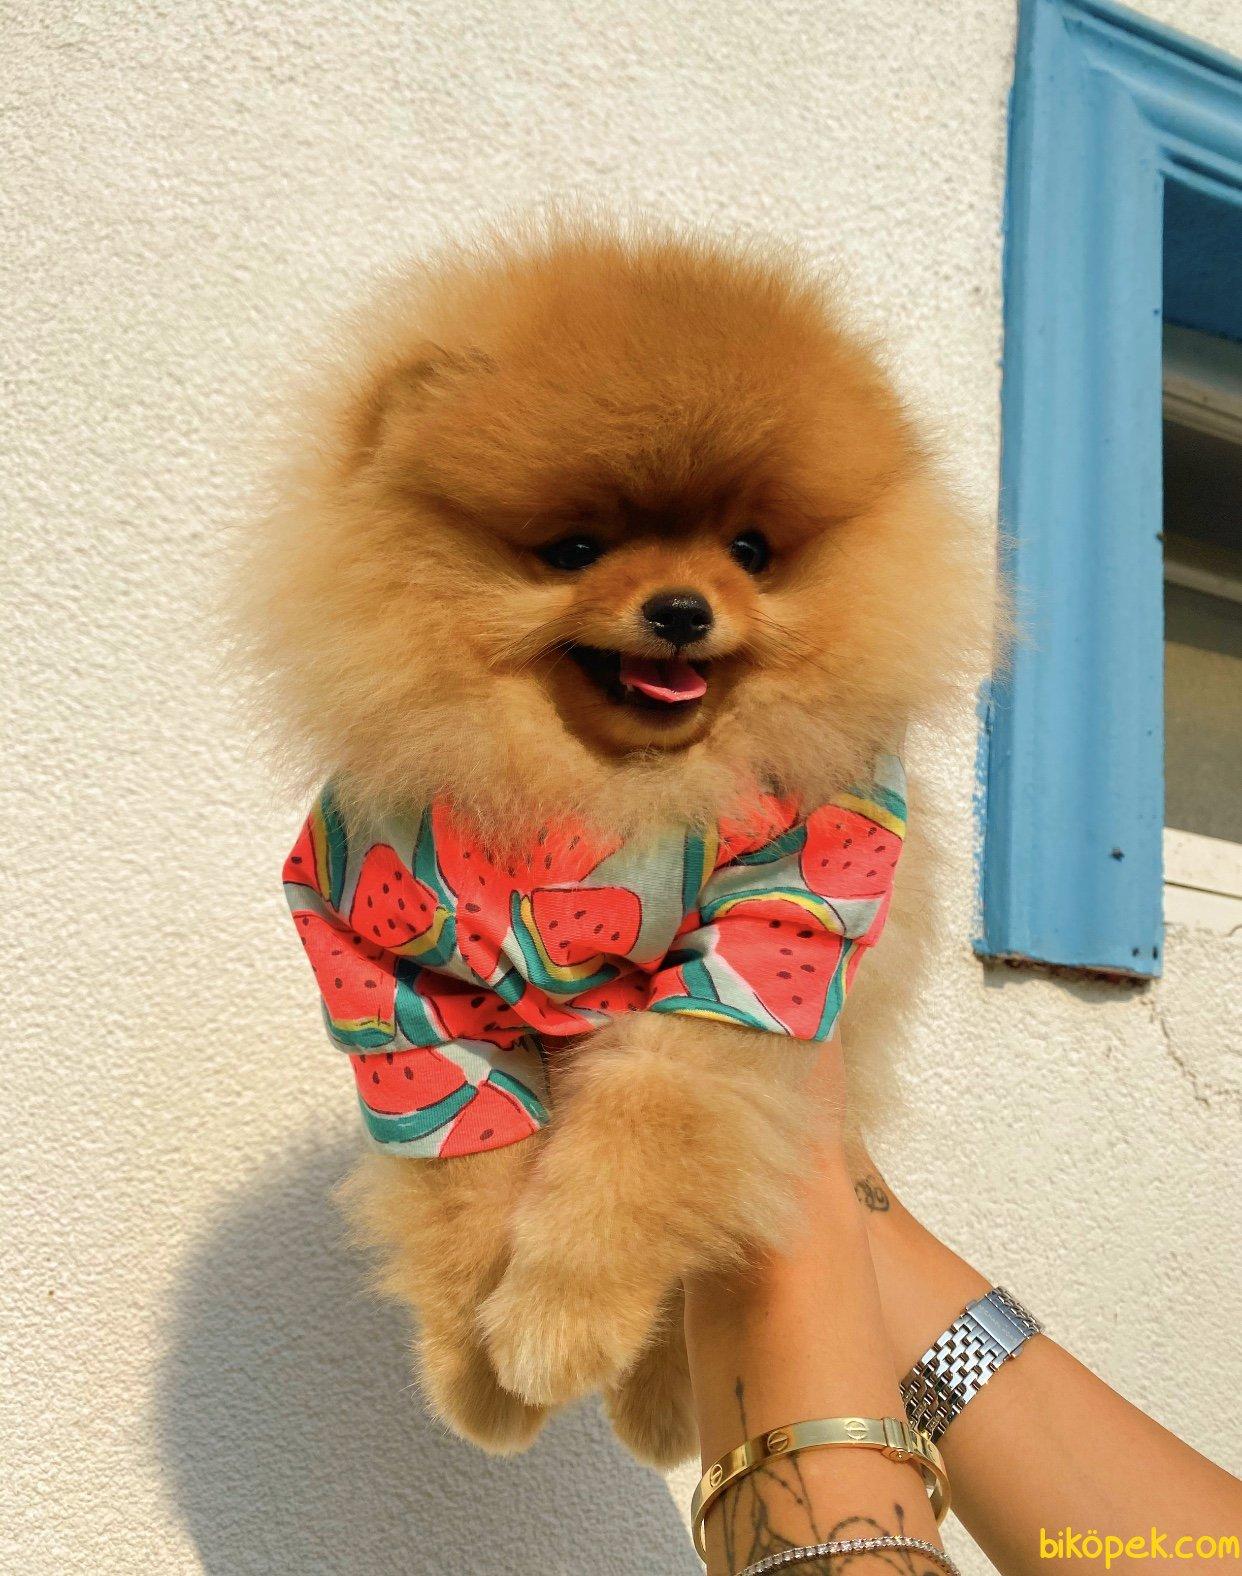 Orjinal Teddy Bear Pomeranian Boo Irk Belgeli 4